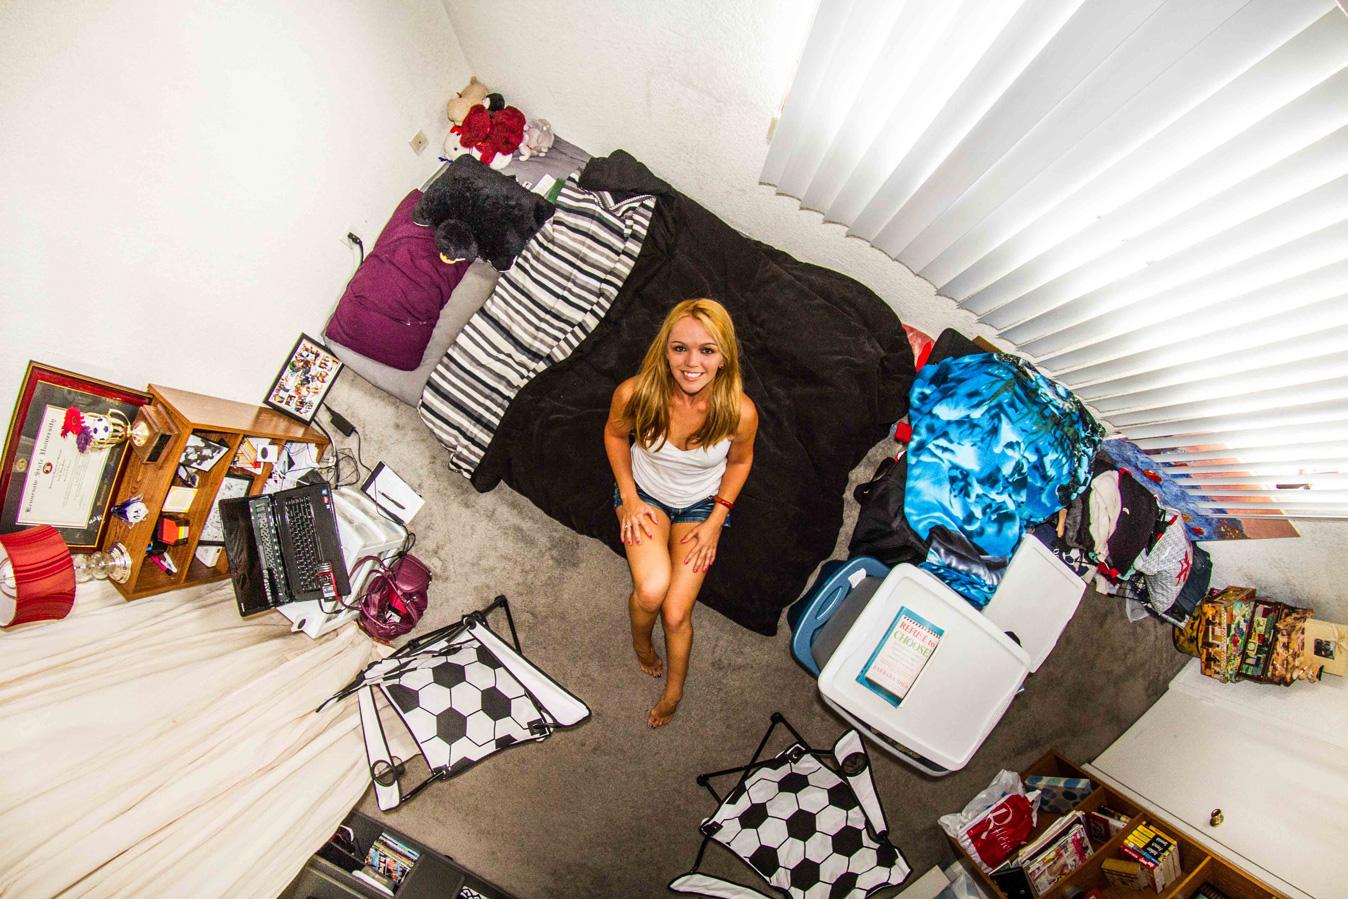 Los Angeles, USA: Tosha, a 26-year-old dancer.